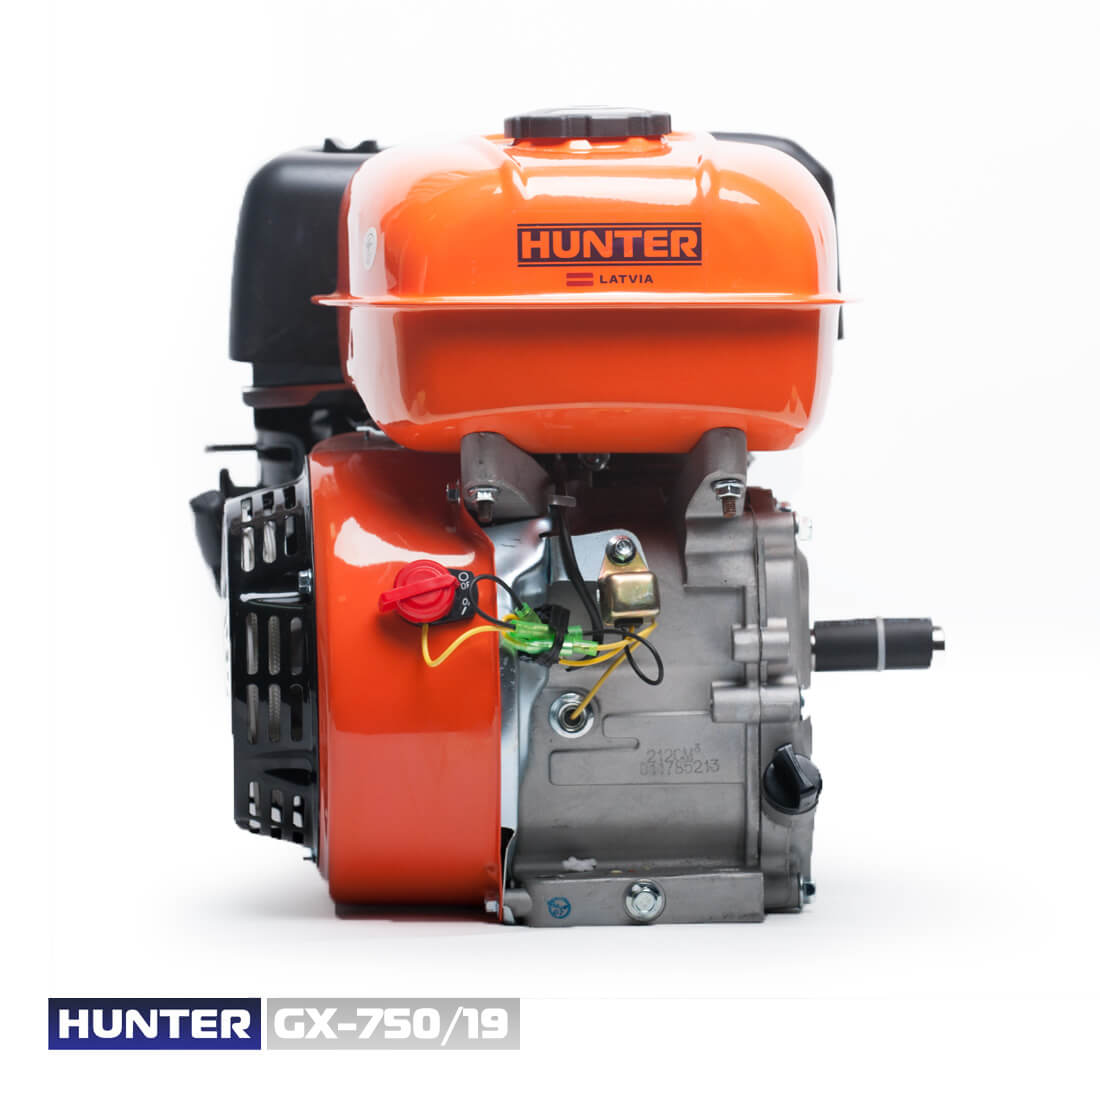 Фото GX-750/19 цена 4250грн №5 — Hunter